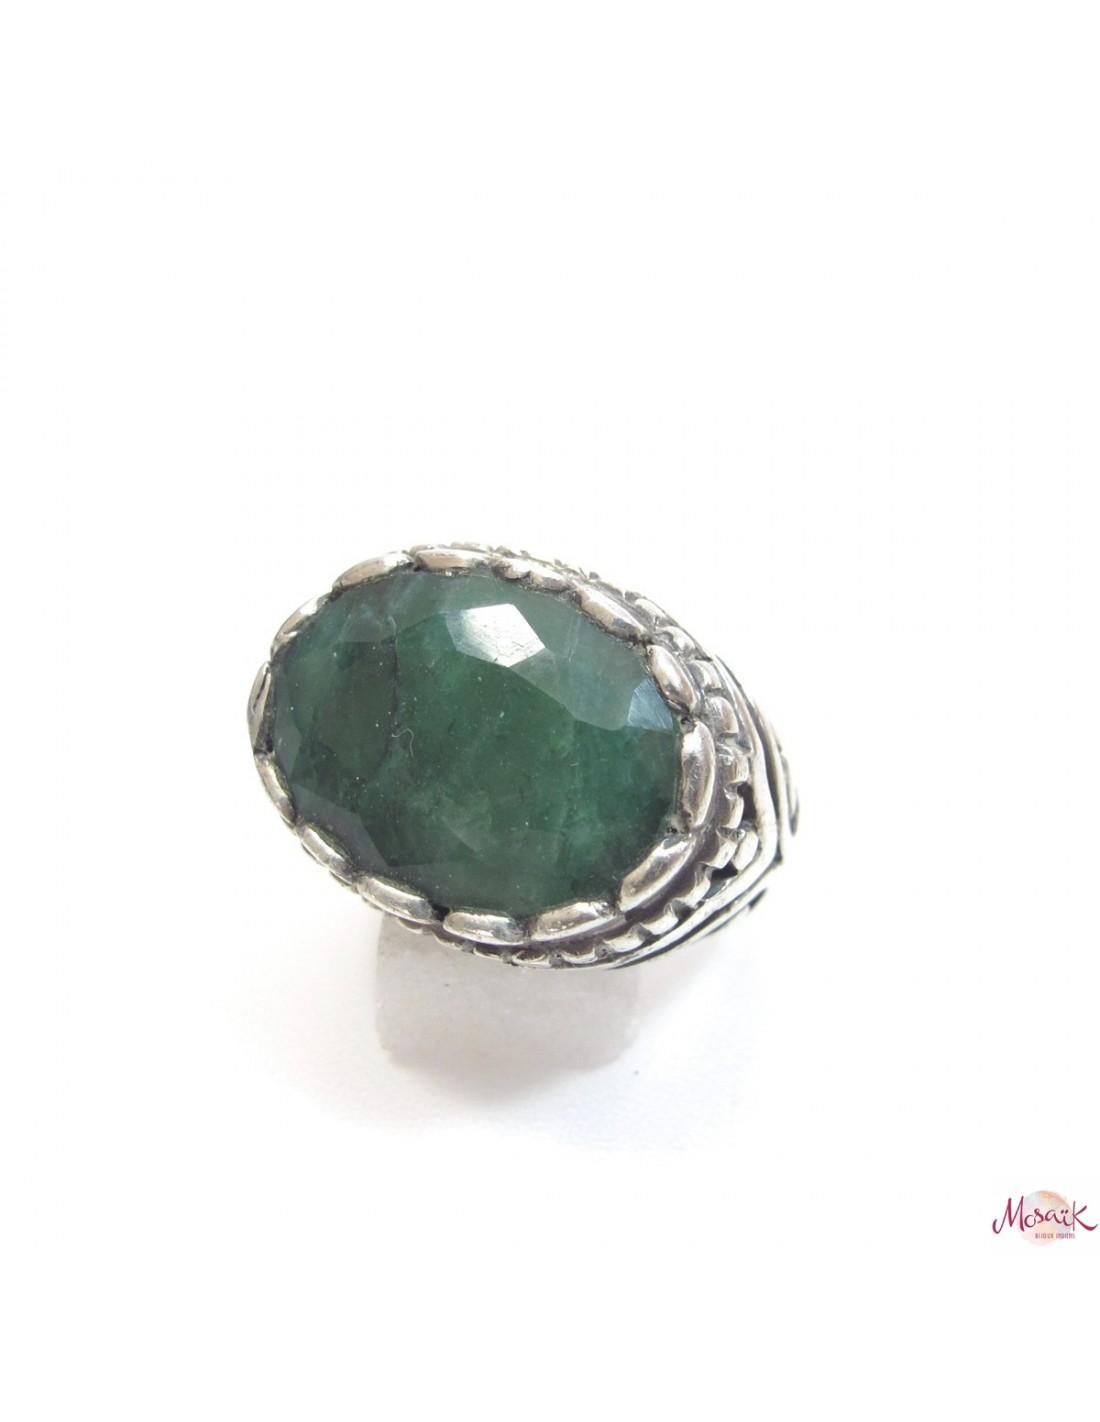 bague argent ovale et pierre verte bijoux en emeraude b162. Black Bedroom Furniture Sets. Home Design Ideas